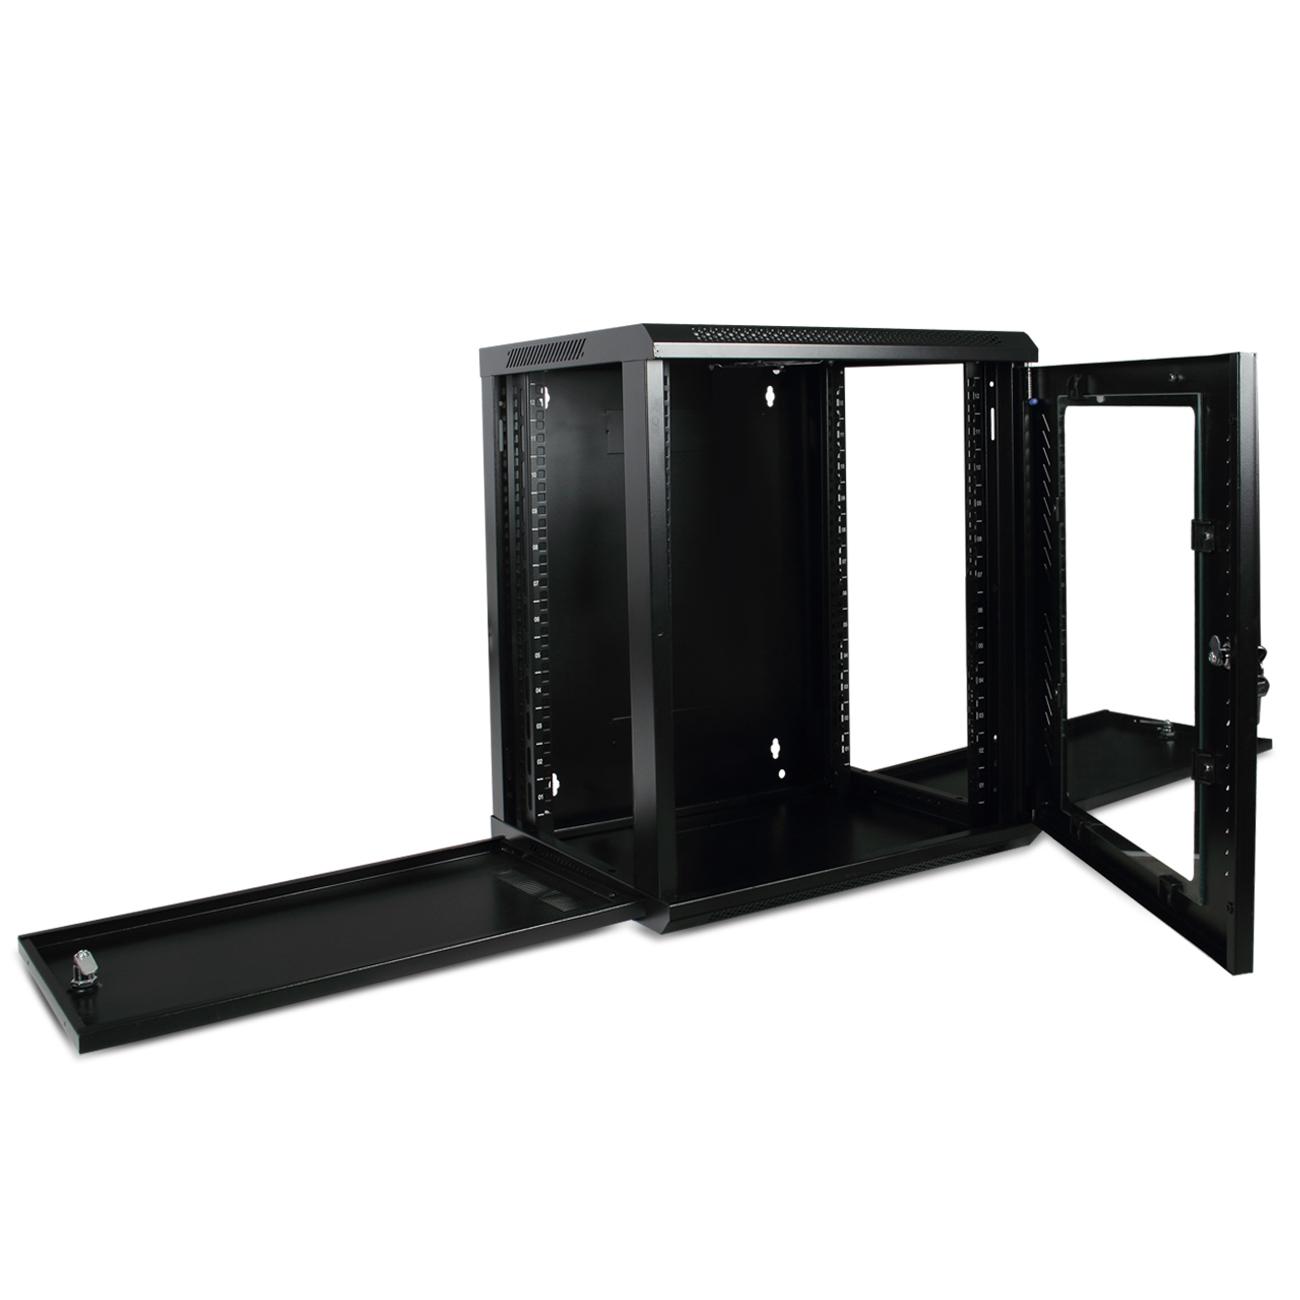 12u Wall Mount Network Equipment Server Data Cabinet Rack